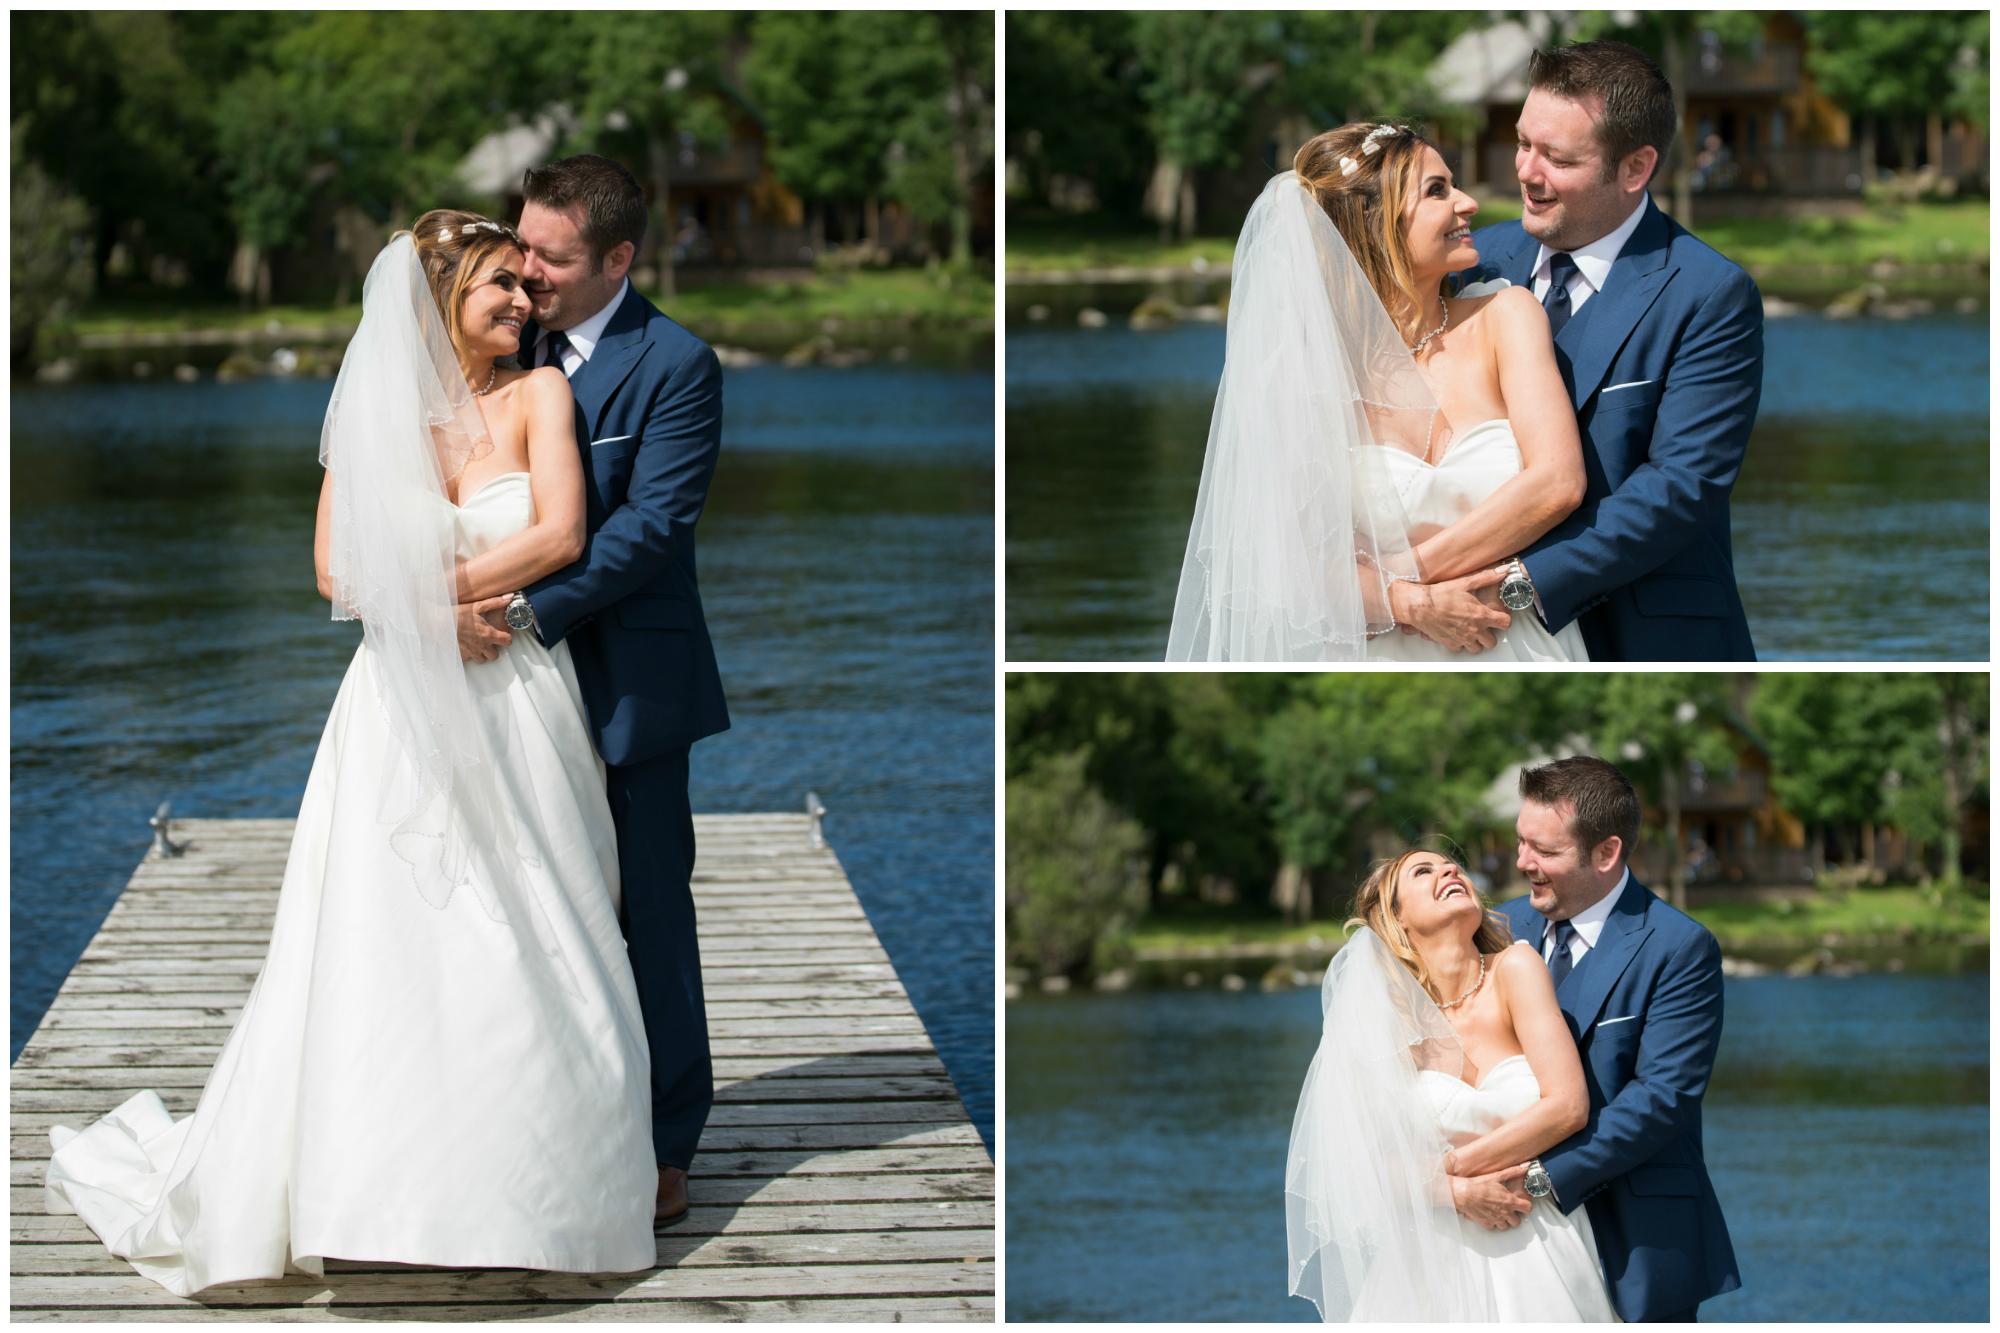 Lusty Beg Island Northern Ireland Wedding Photographers Pure Photo Bride and Groom fun portraits